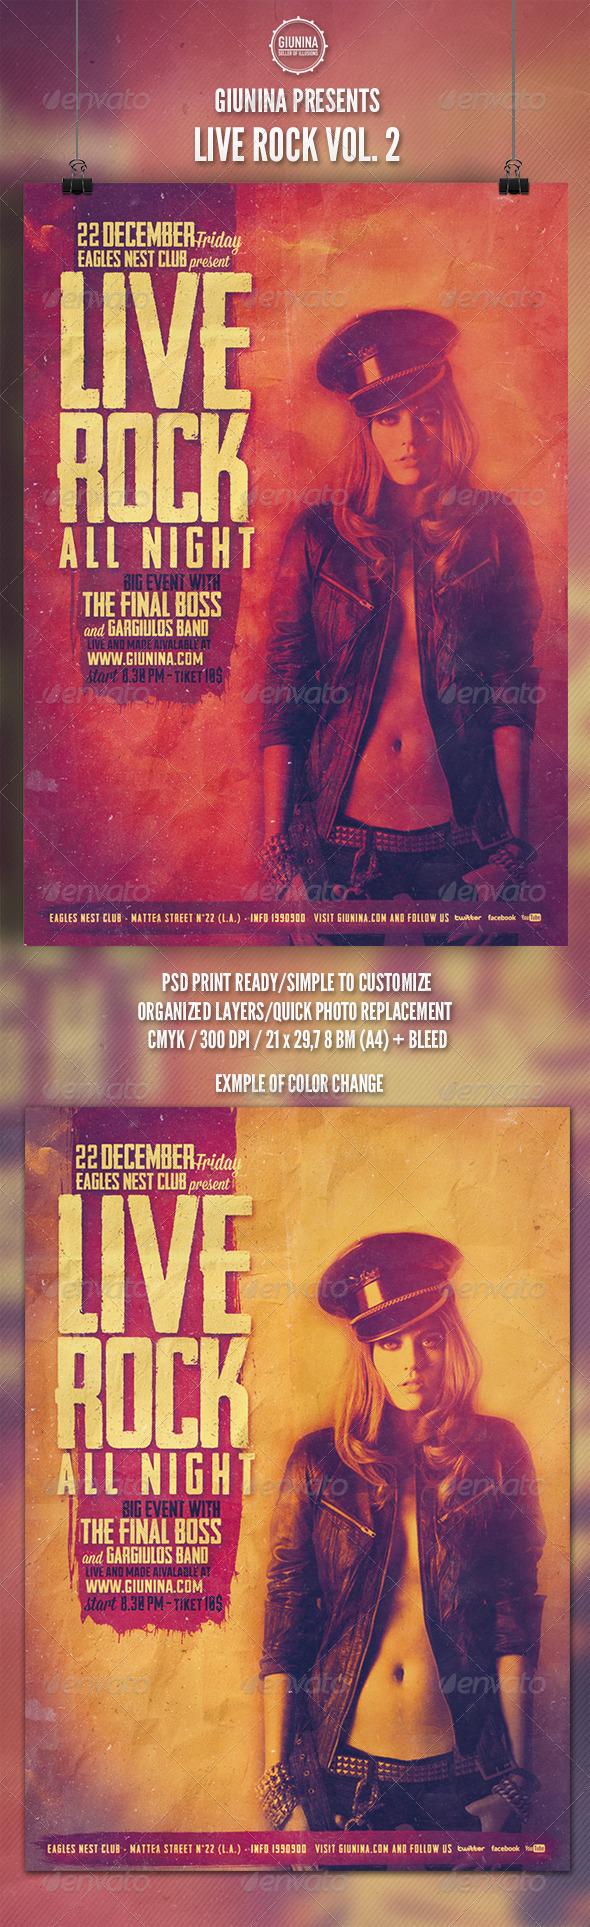 GraphicRiver Rock Live Vol.2 Flyer Poster 5901790